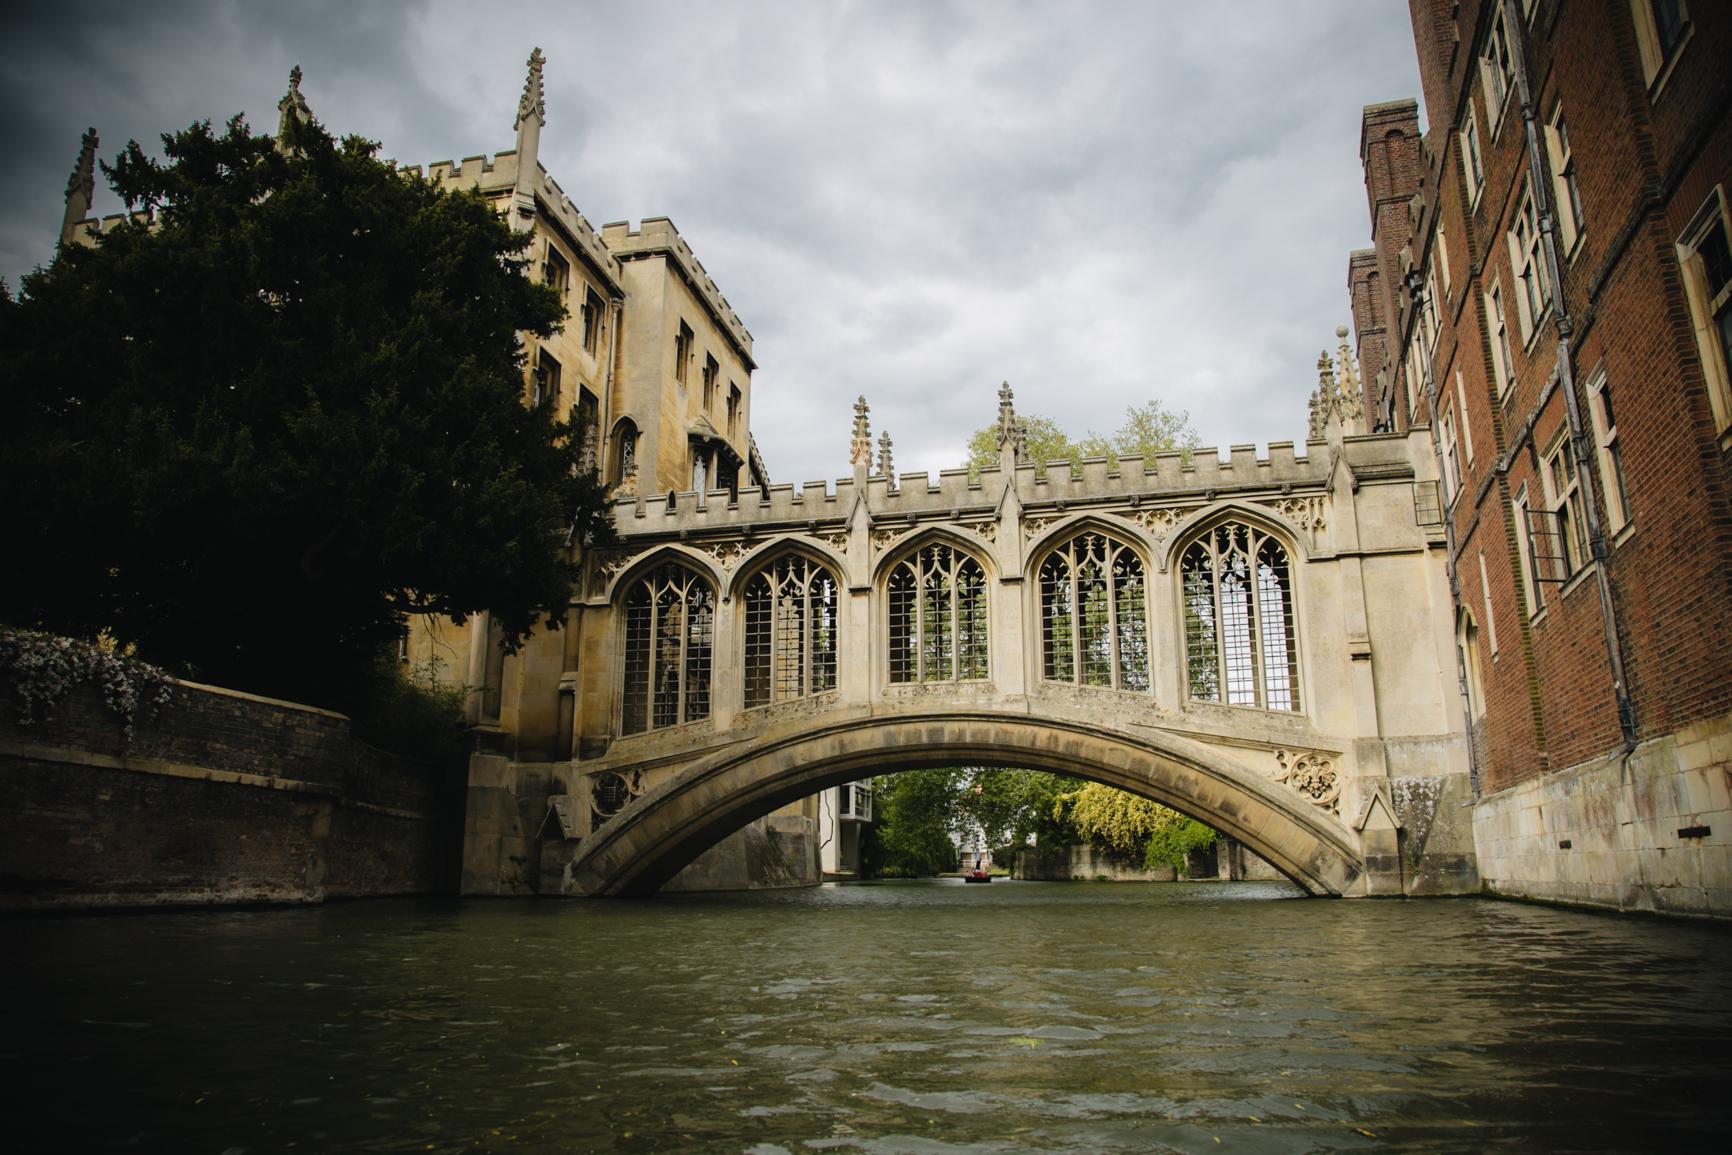 Punting-in-Cambridge-bridge-sighs-travel.jpg